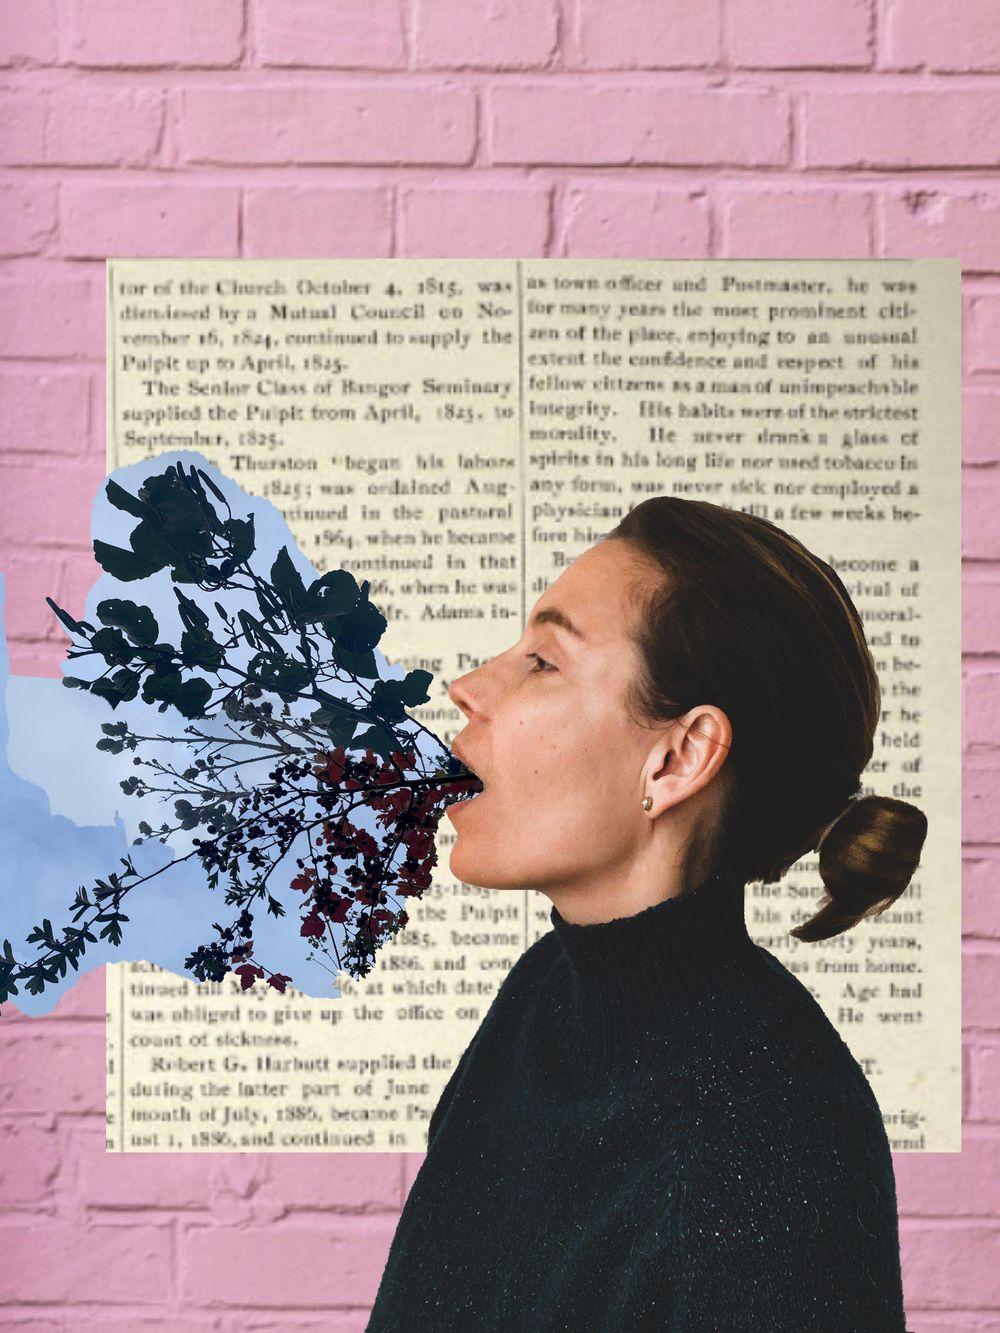 Composite Portrait Examples :) - image 4 - student project